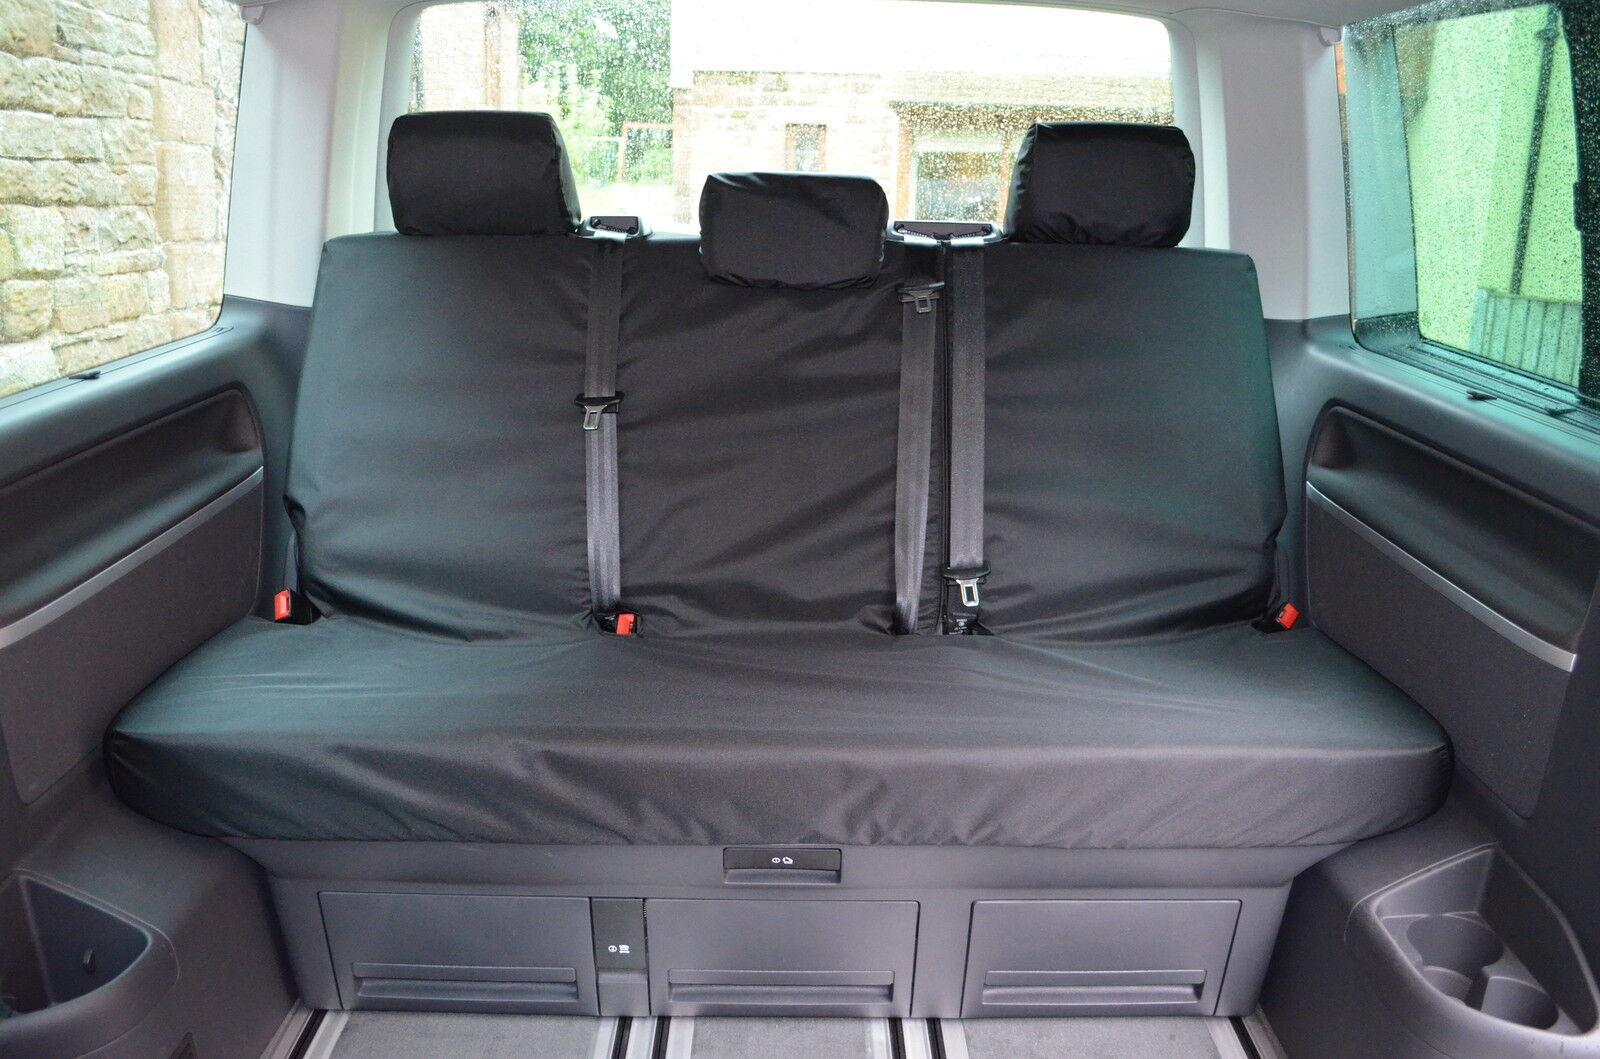 vw t5 t6 caravelle 2003 rear bench waterproof tailored. Black Bedroom Furniture Sets. Home Design Ideas